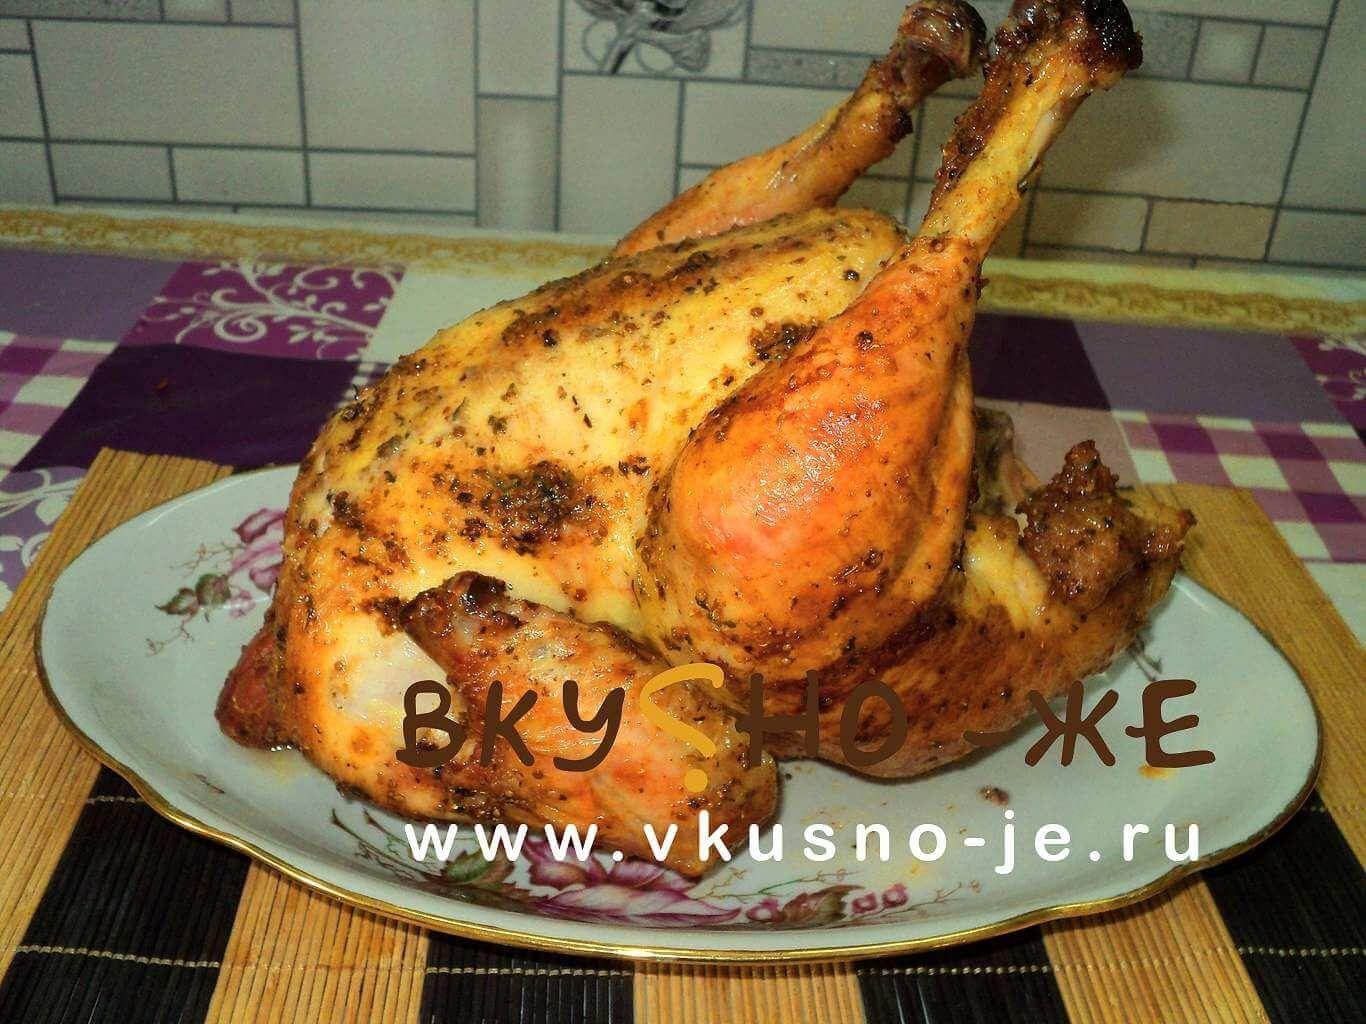 курица целиком на банке в духовке рецепт с фото